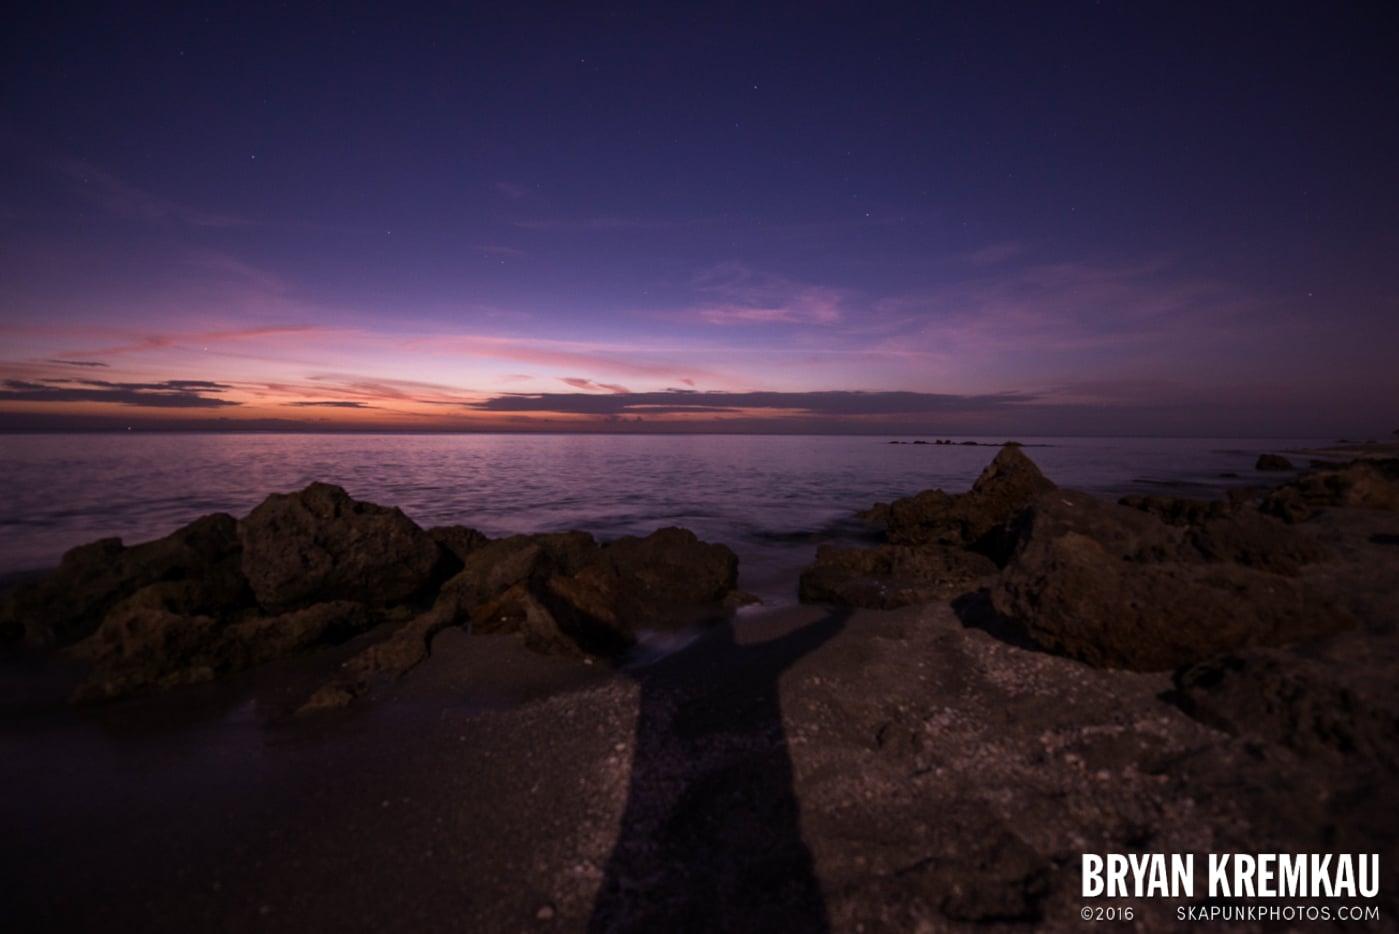 Sunsets, Astrophotography & Birds @ Venice, Florida - 10.25.14 - 11.5.14 (49)